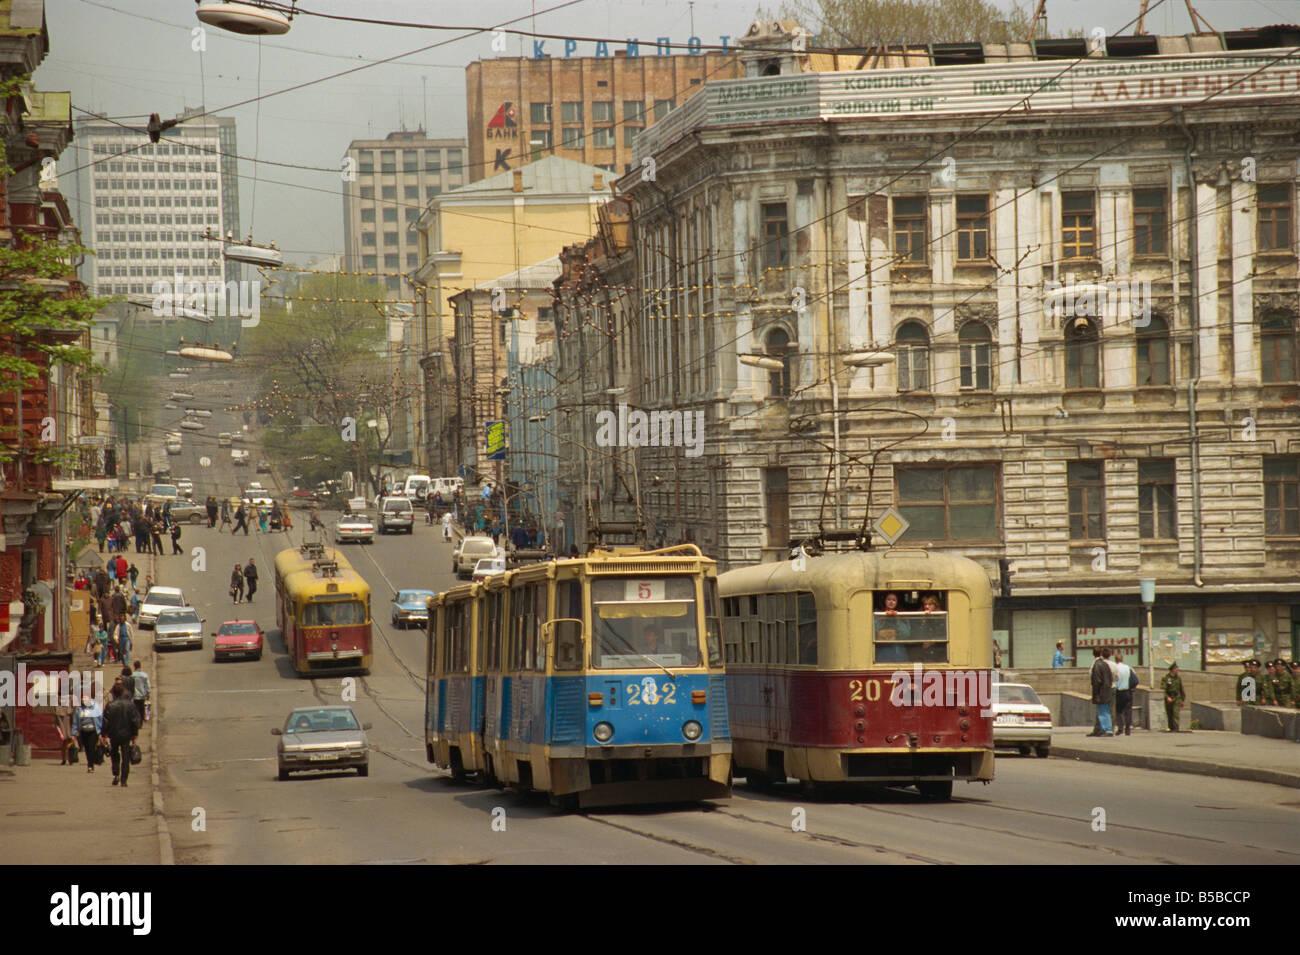 Tranvías en la calle Vladivostok Lejano Oriente ruso Rusia Europa Imagen De Stock